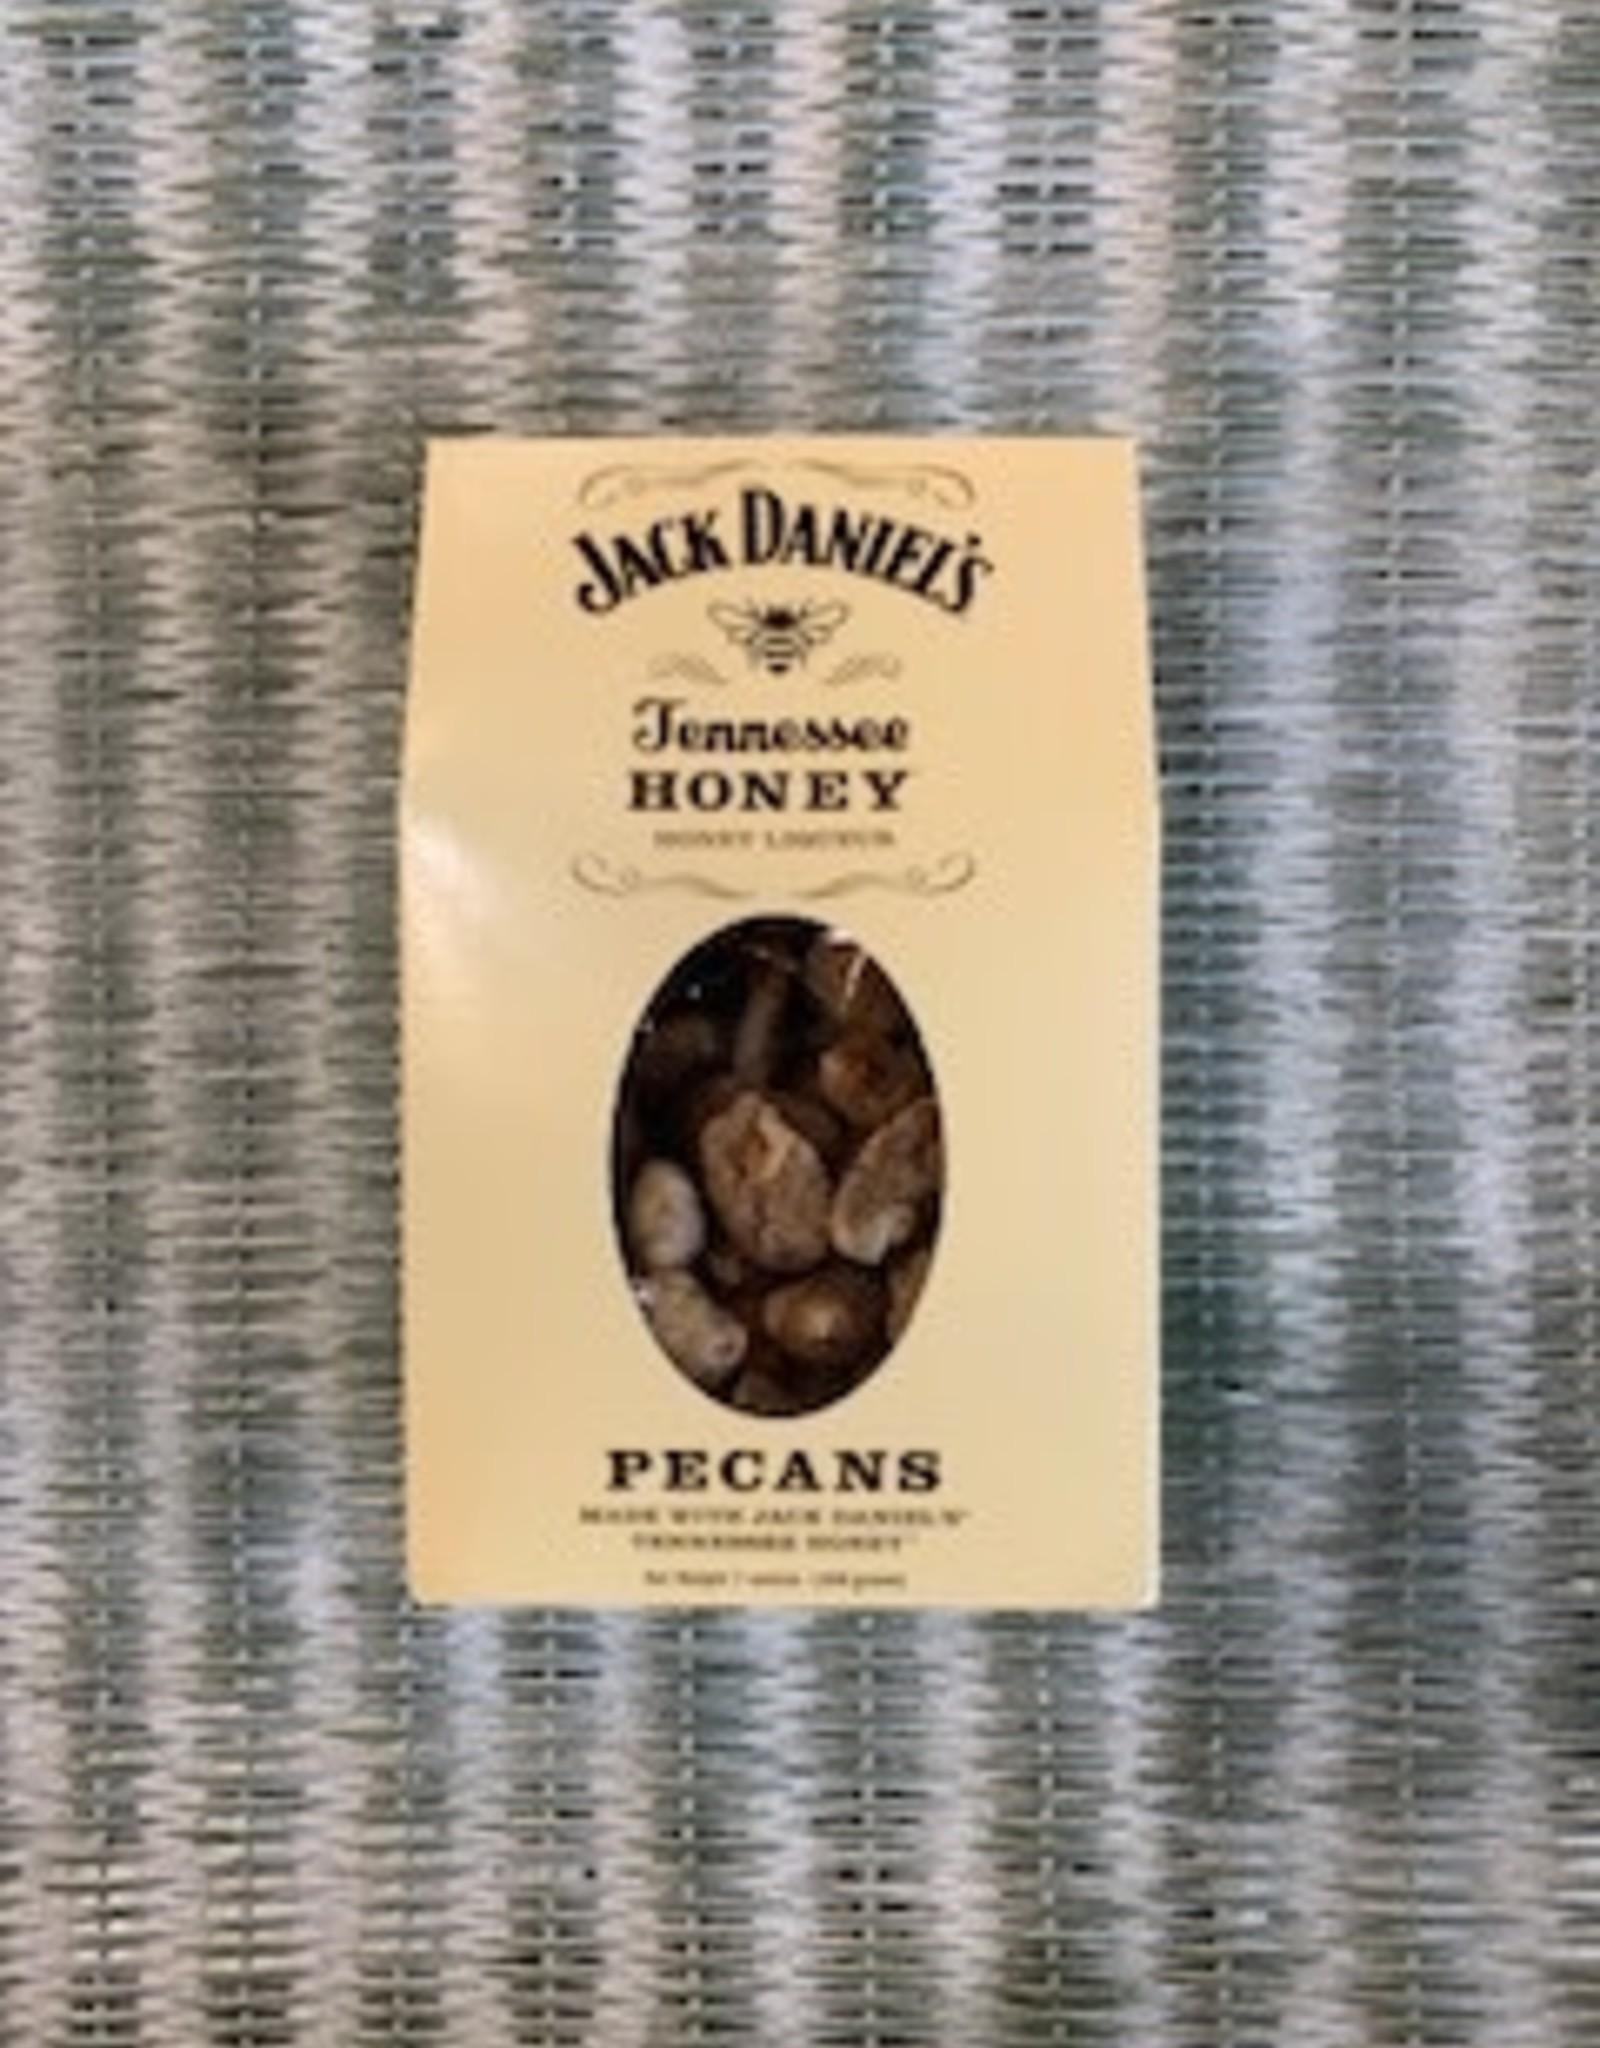 Jack Daniel's Tennessee Honey Pecans - 7 oz.